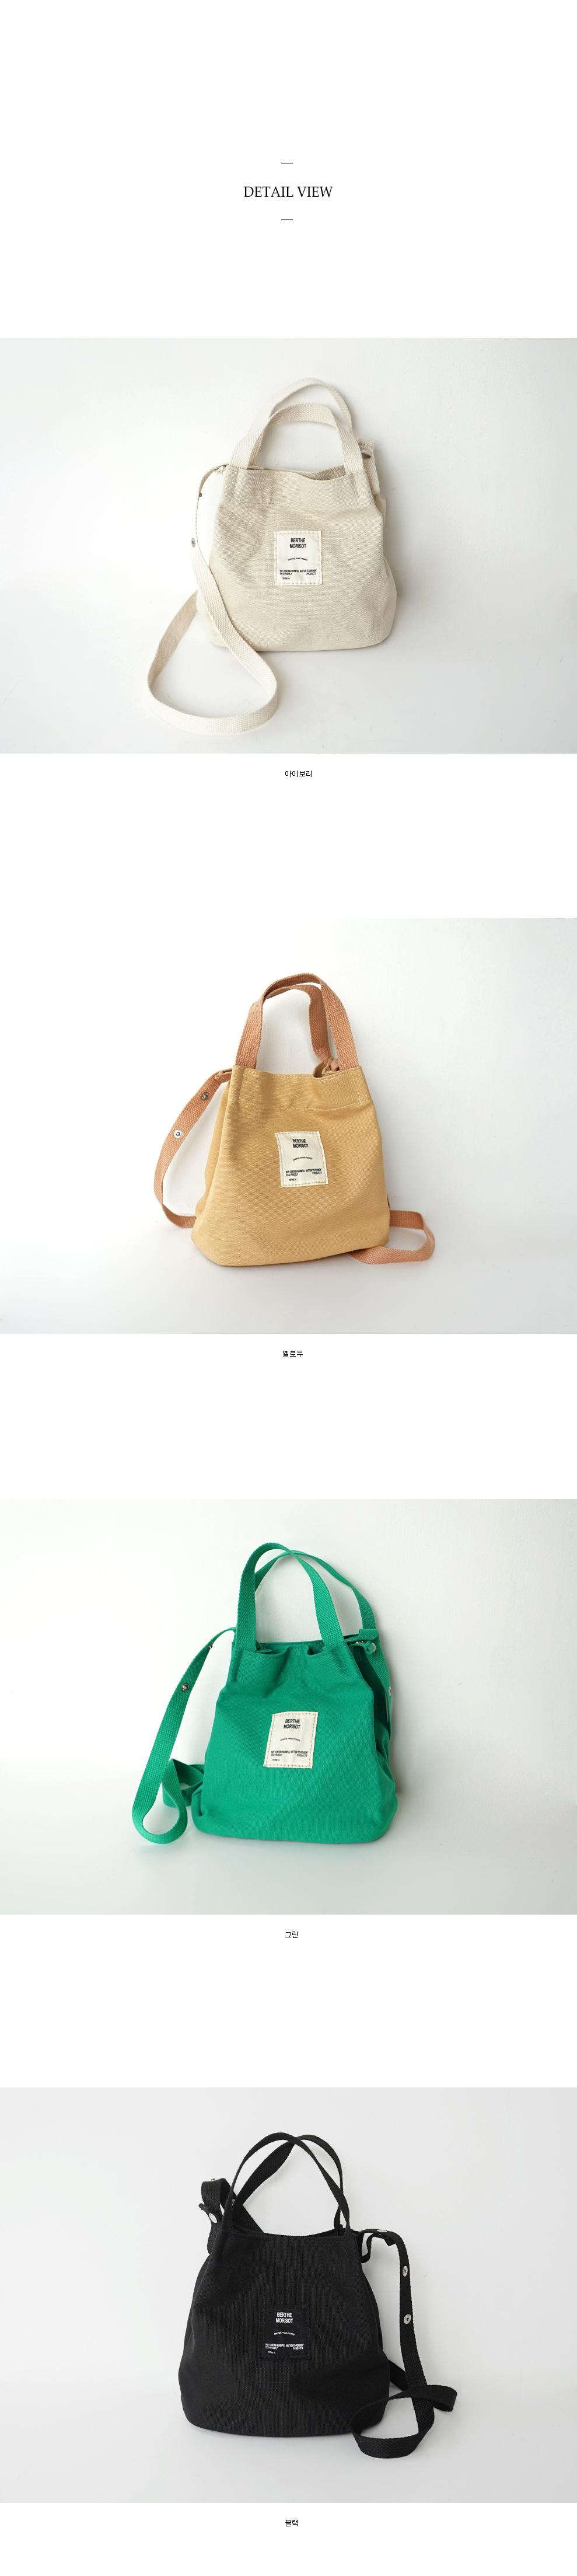 handy cotton bucket bag (4colors)